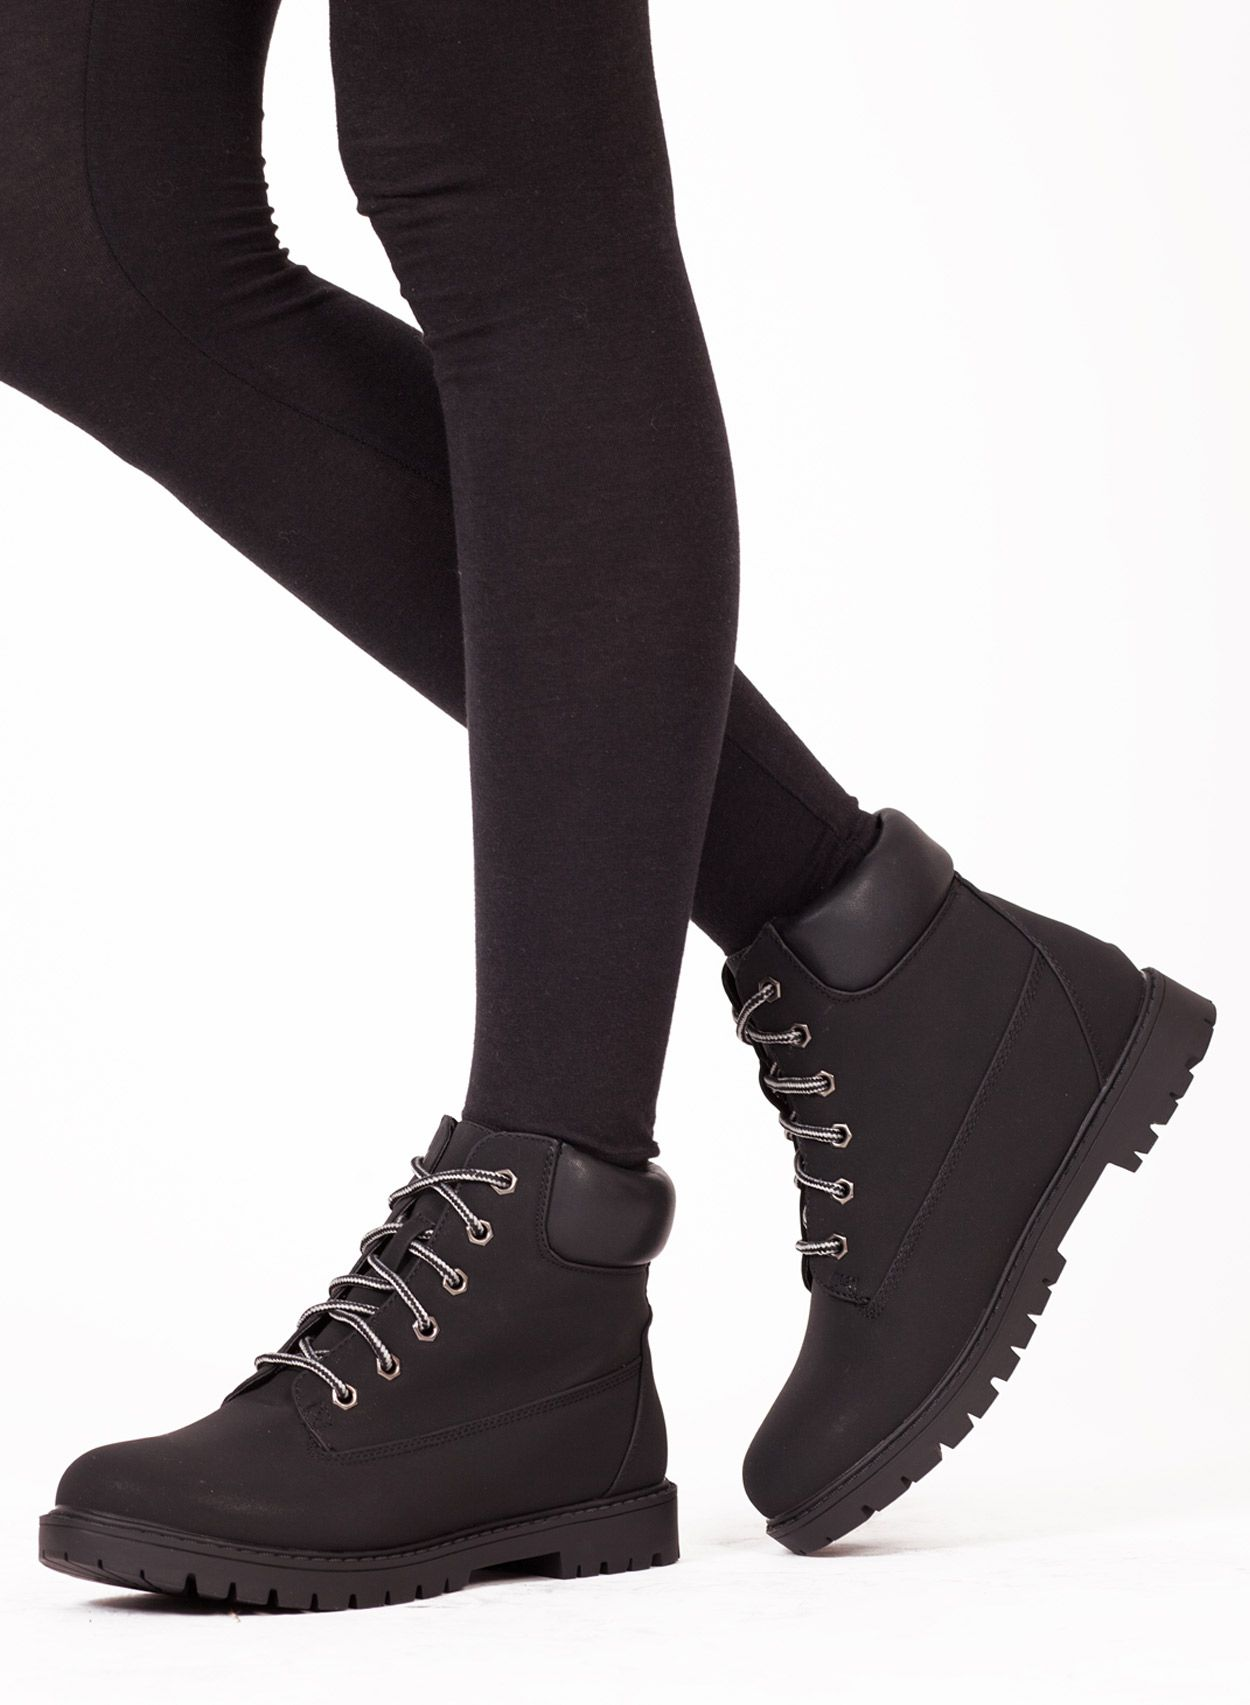 Shop Women's Black Trucker Desert Boot. Buy retro & indie fashion at Phix  ...